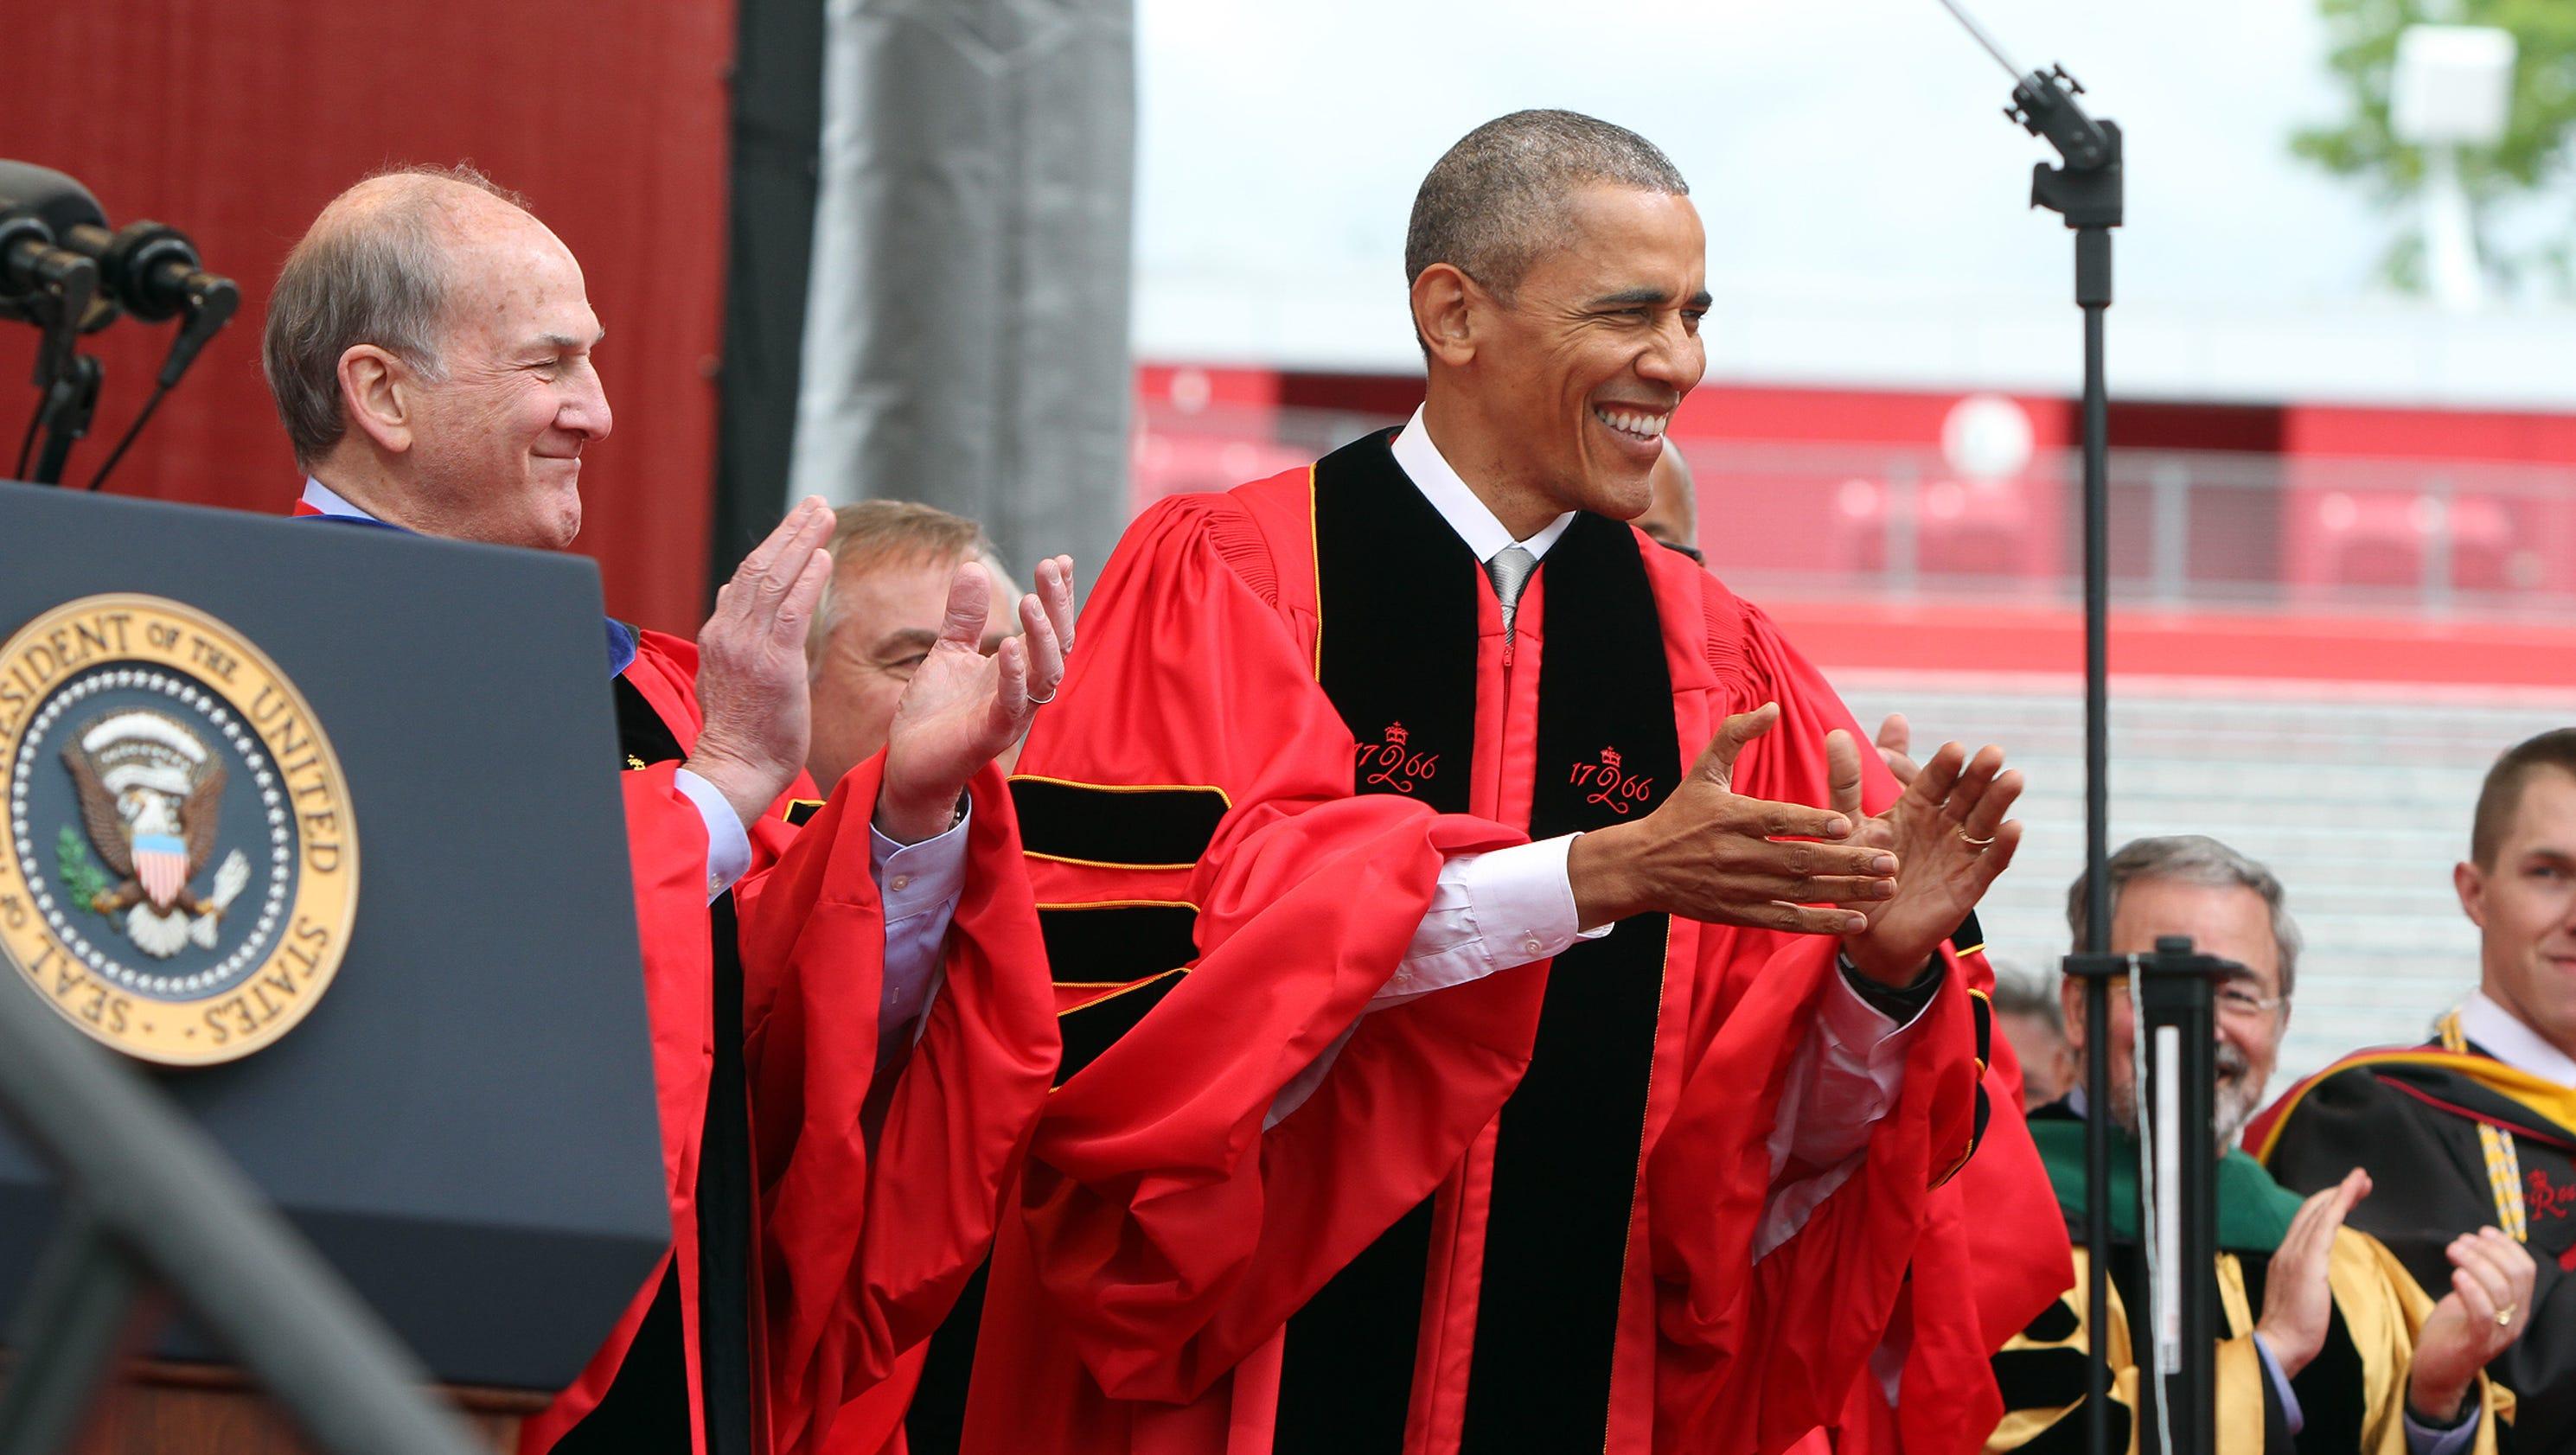 WATCH LIVE: 2016 Rutgers University Commencement